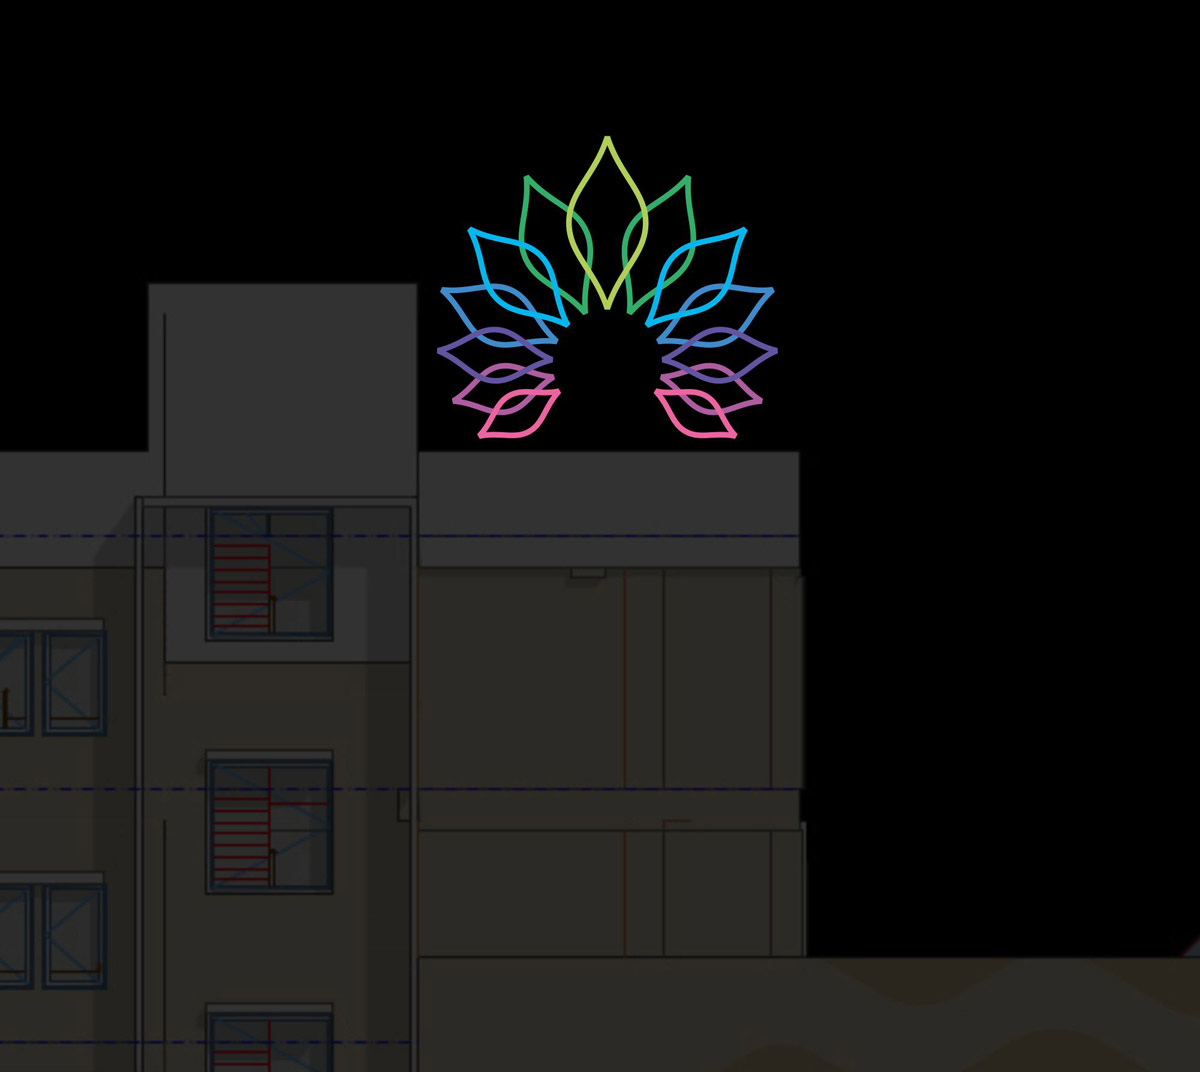 Outdoor Signage Design for Shree Bajrangdasbapa Arogyadham